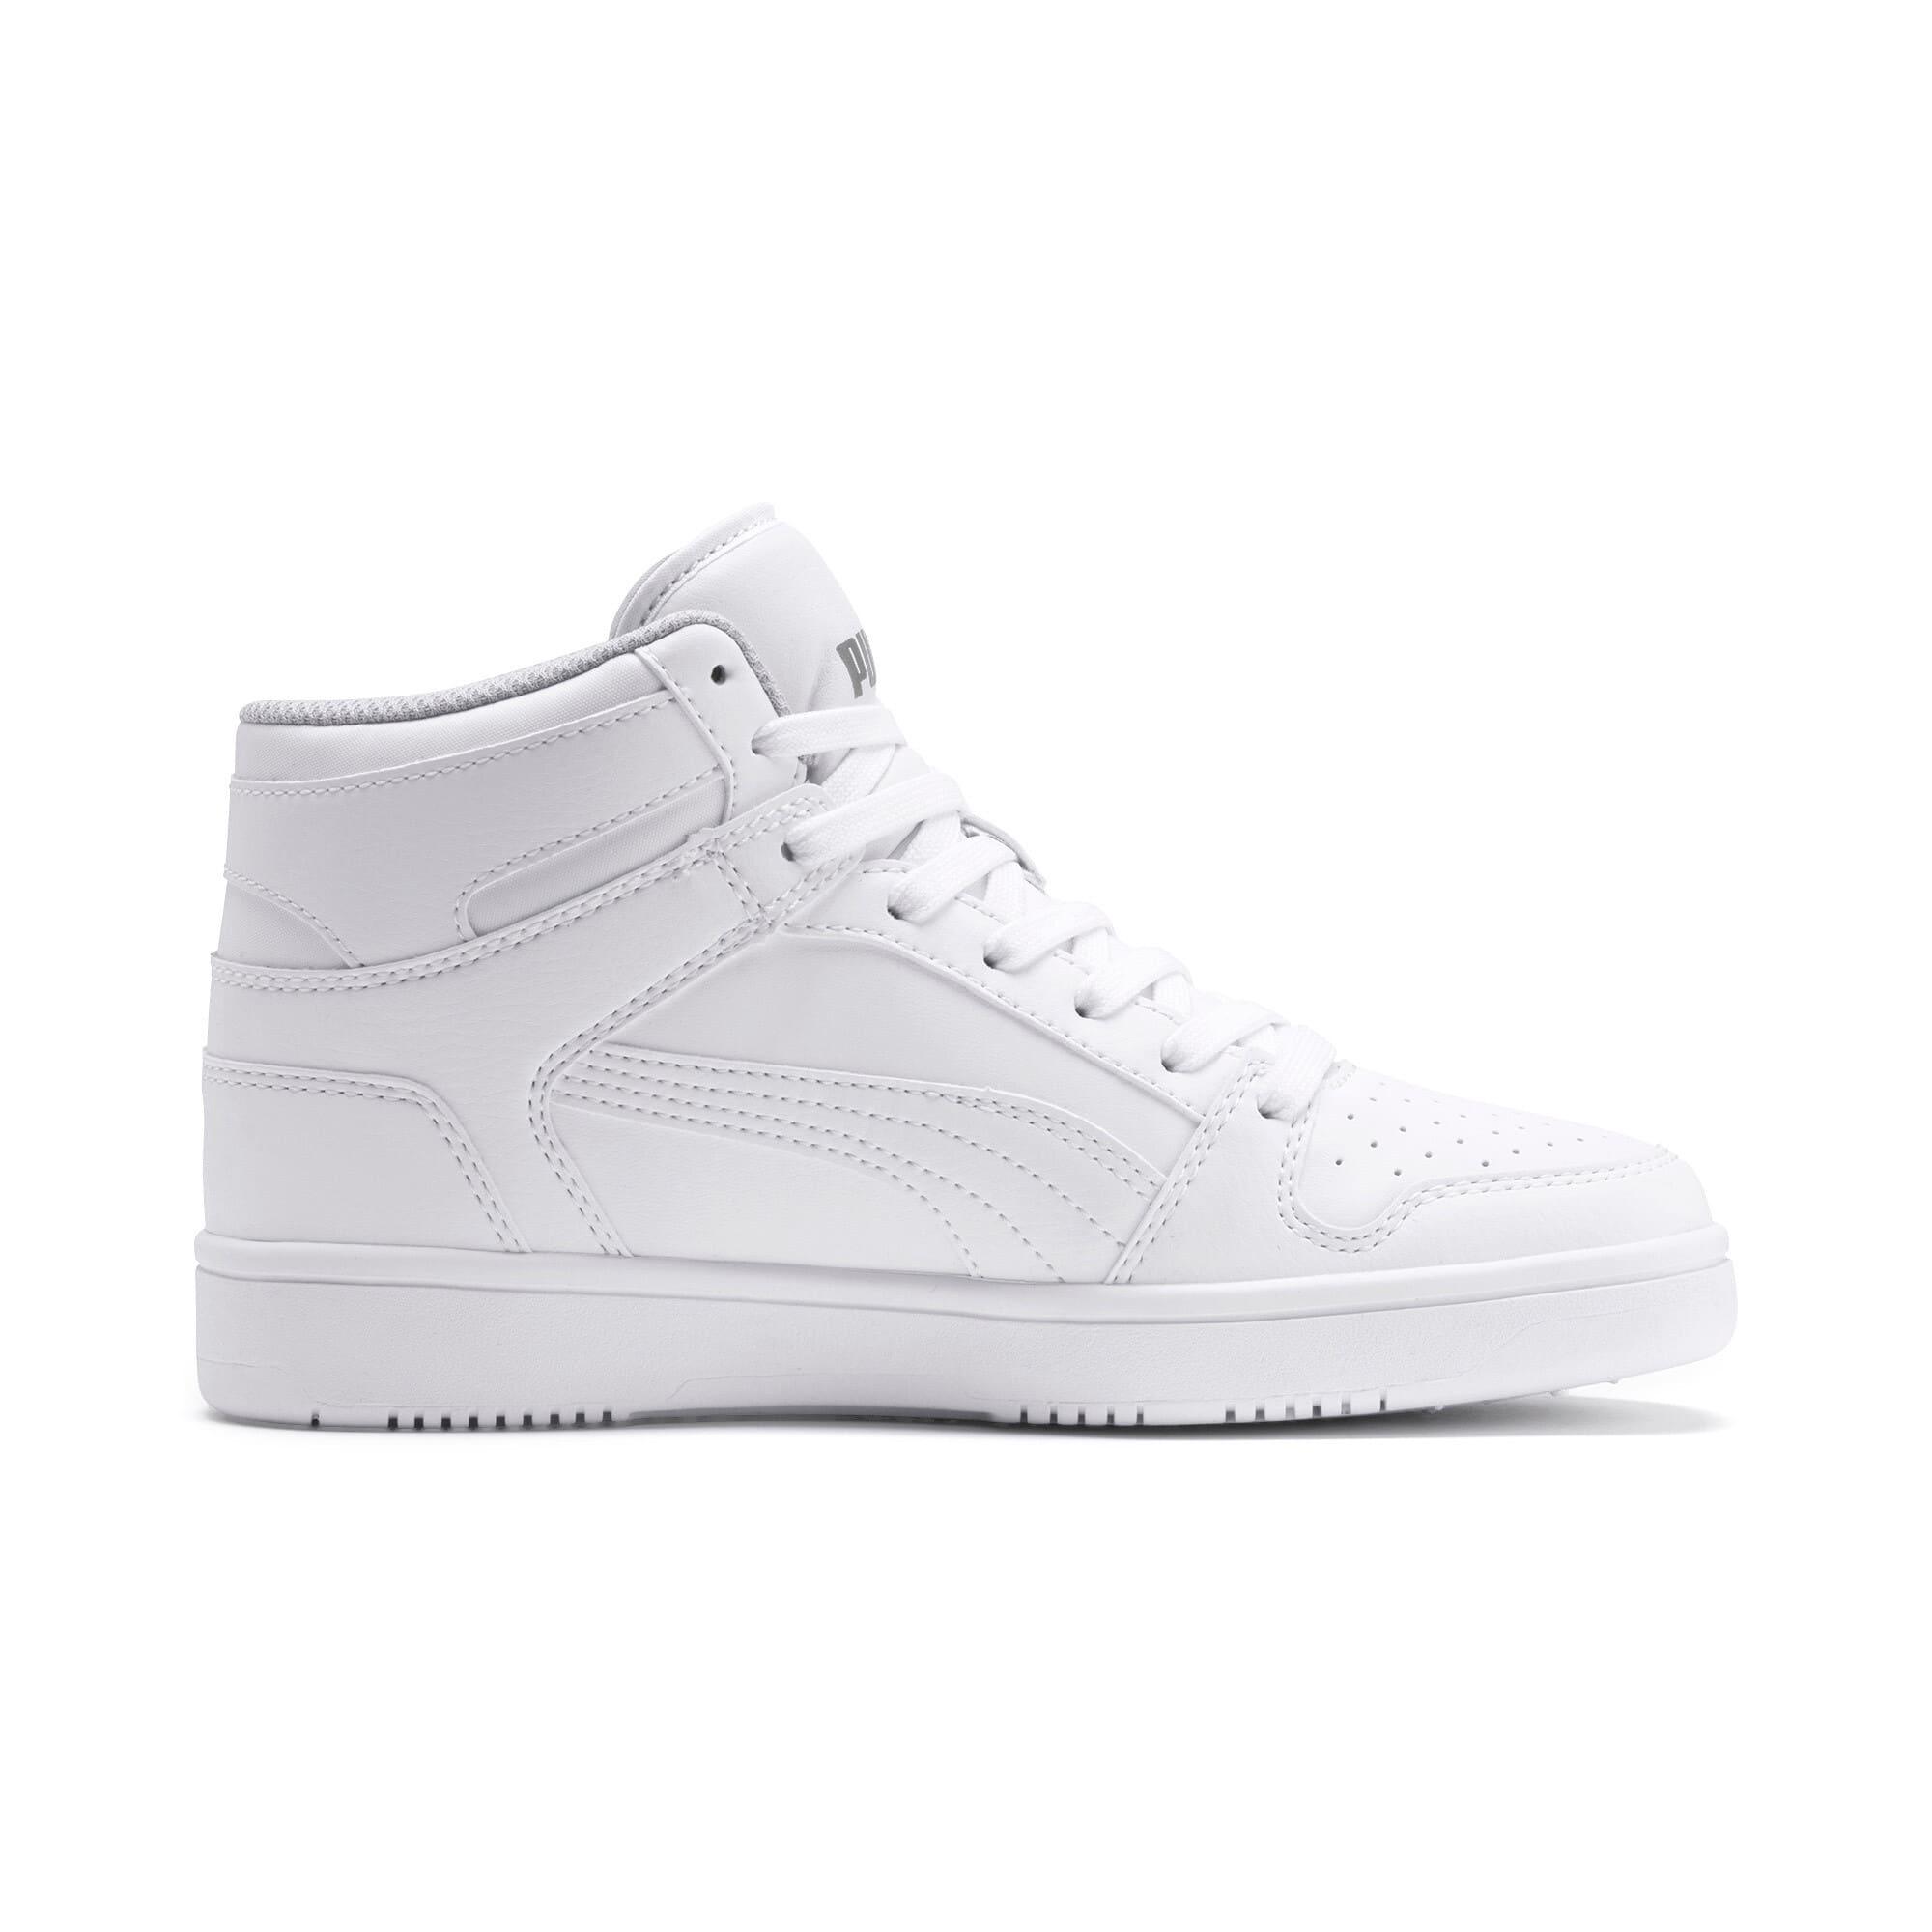 Thumbnail 5 of PUMA Rebound LayUp Mid Sneakers JR, Puma White-Gray Violet, medium